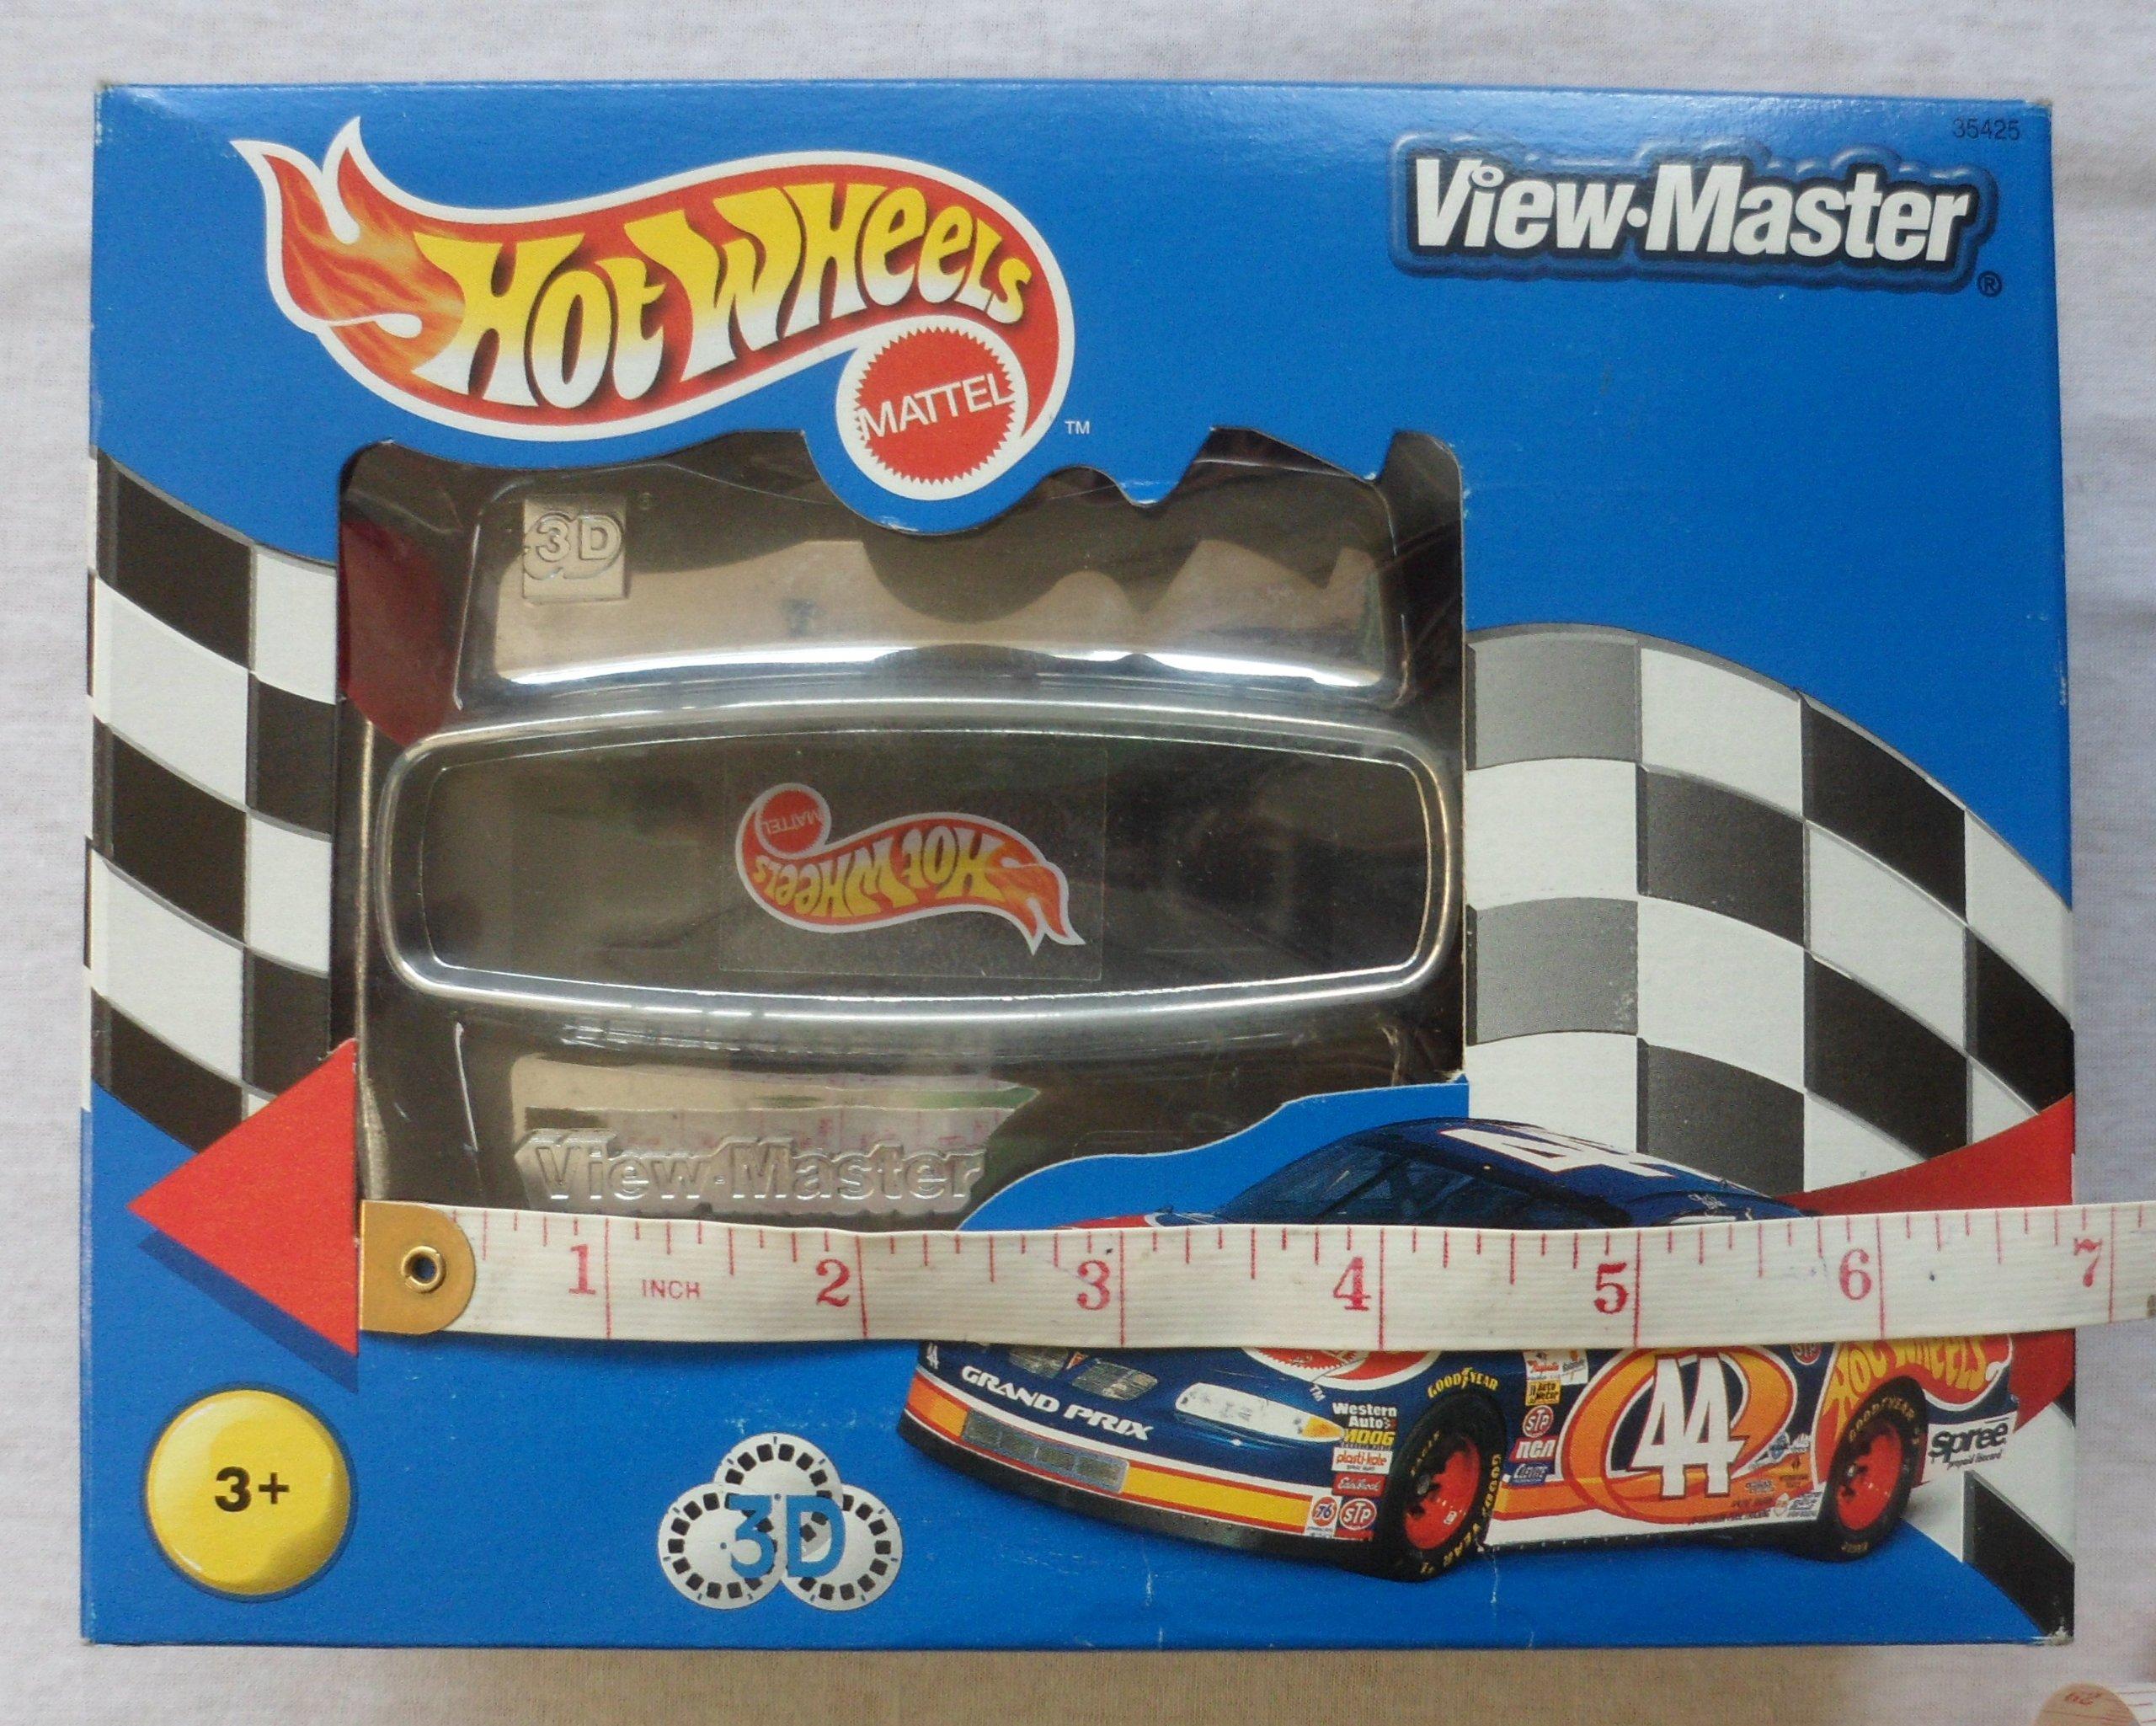 HOT WHEELS Racing Kyle Petty View Master Mattel by Hot Wheels